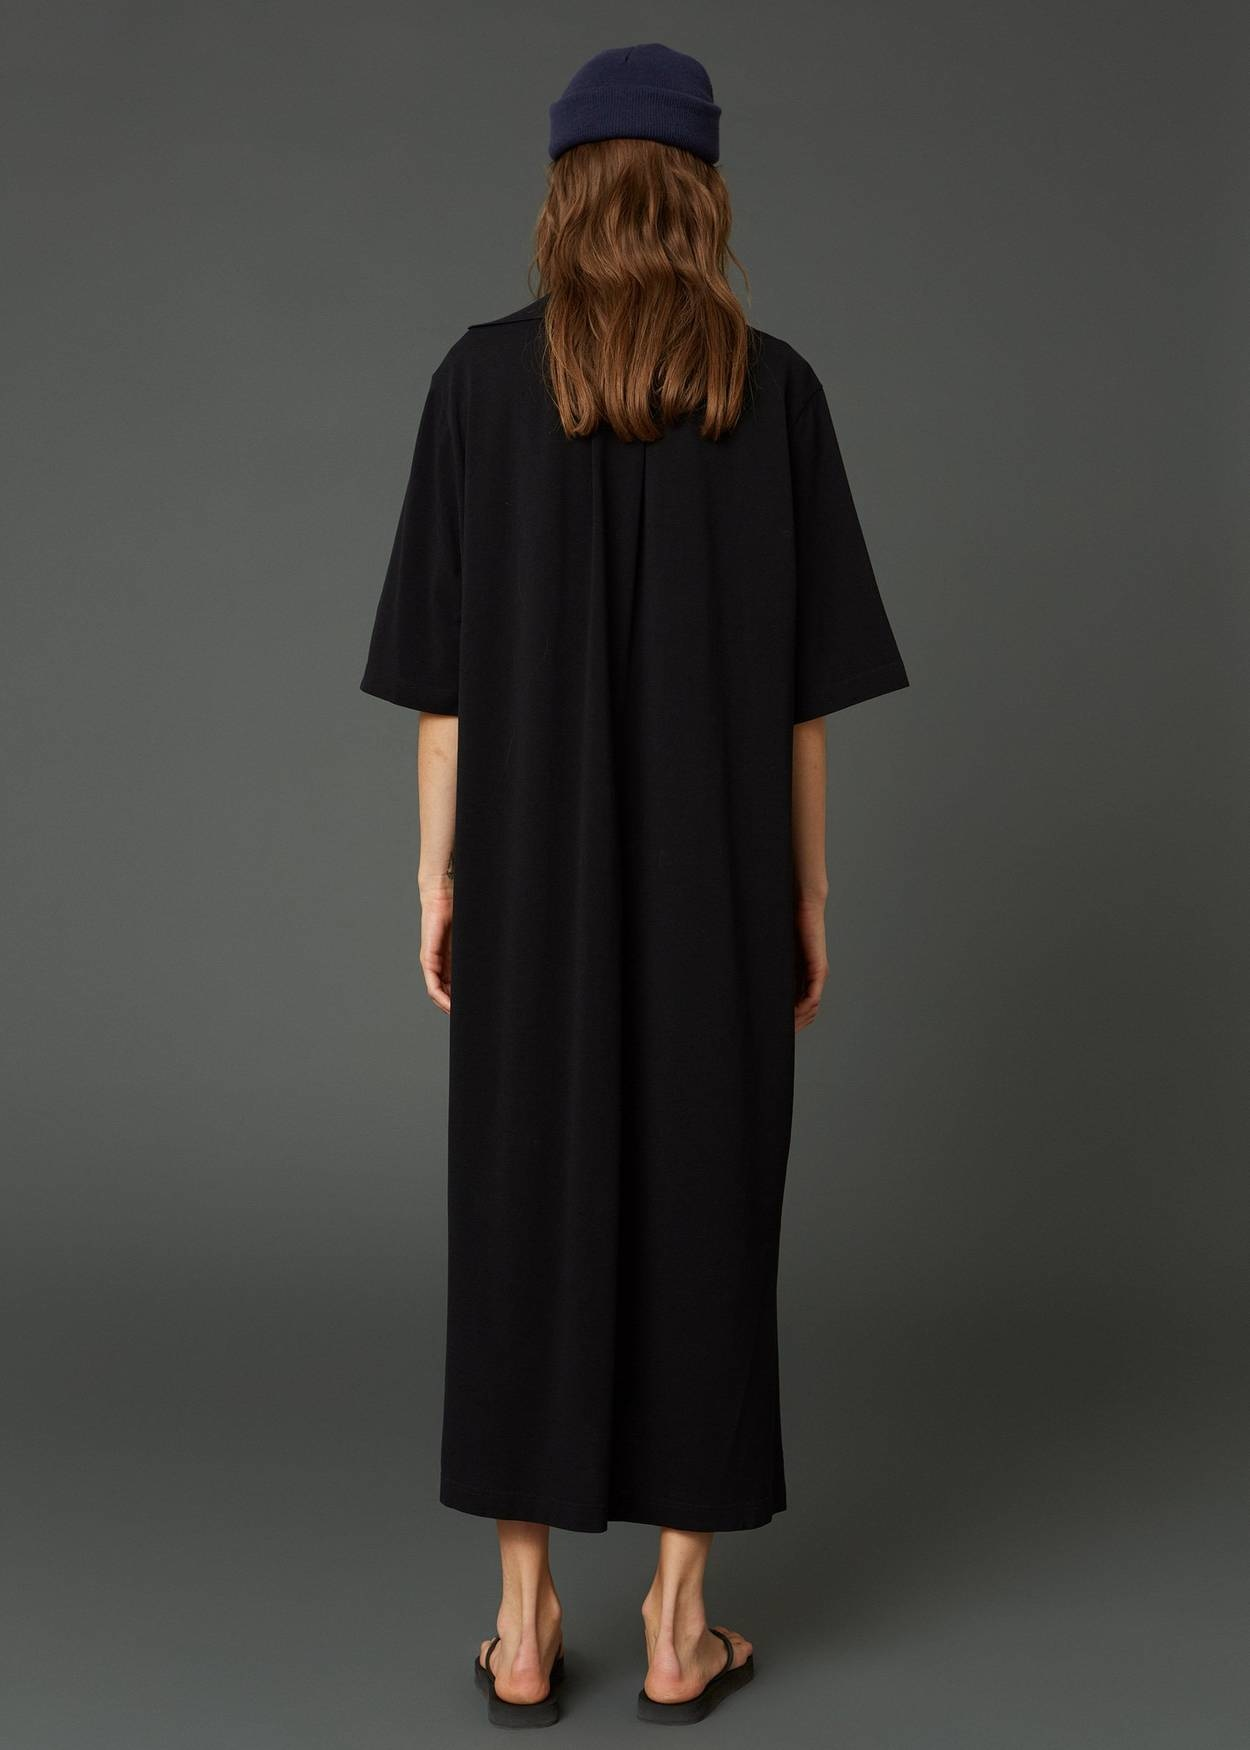 Polo dress black